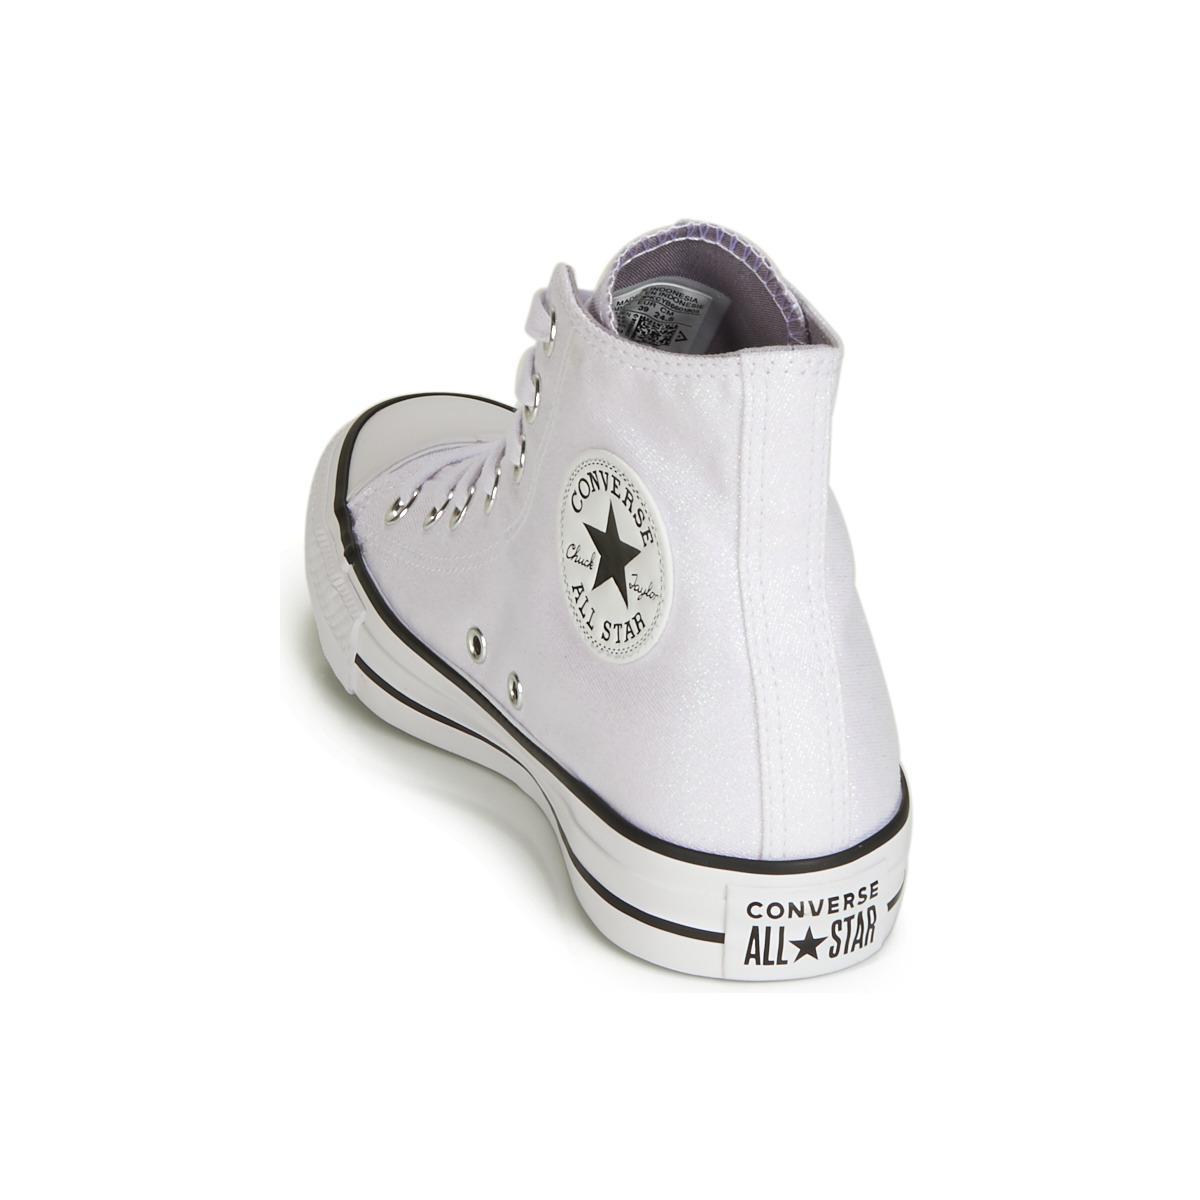 CHUCK TAYLOR ALL STAR HI Chaussures Converse en coloris Blanc